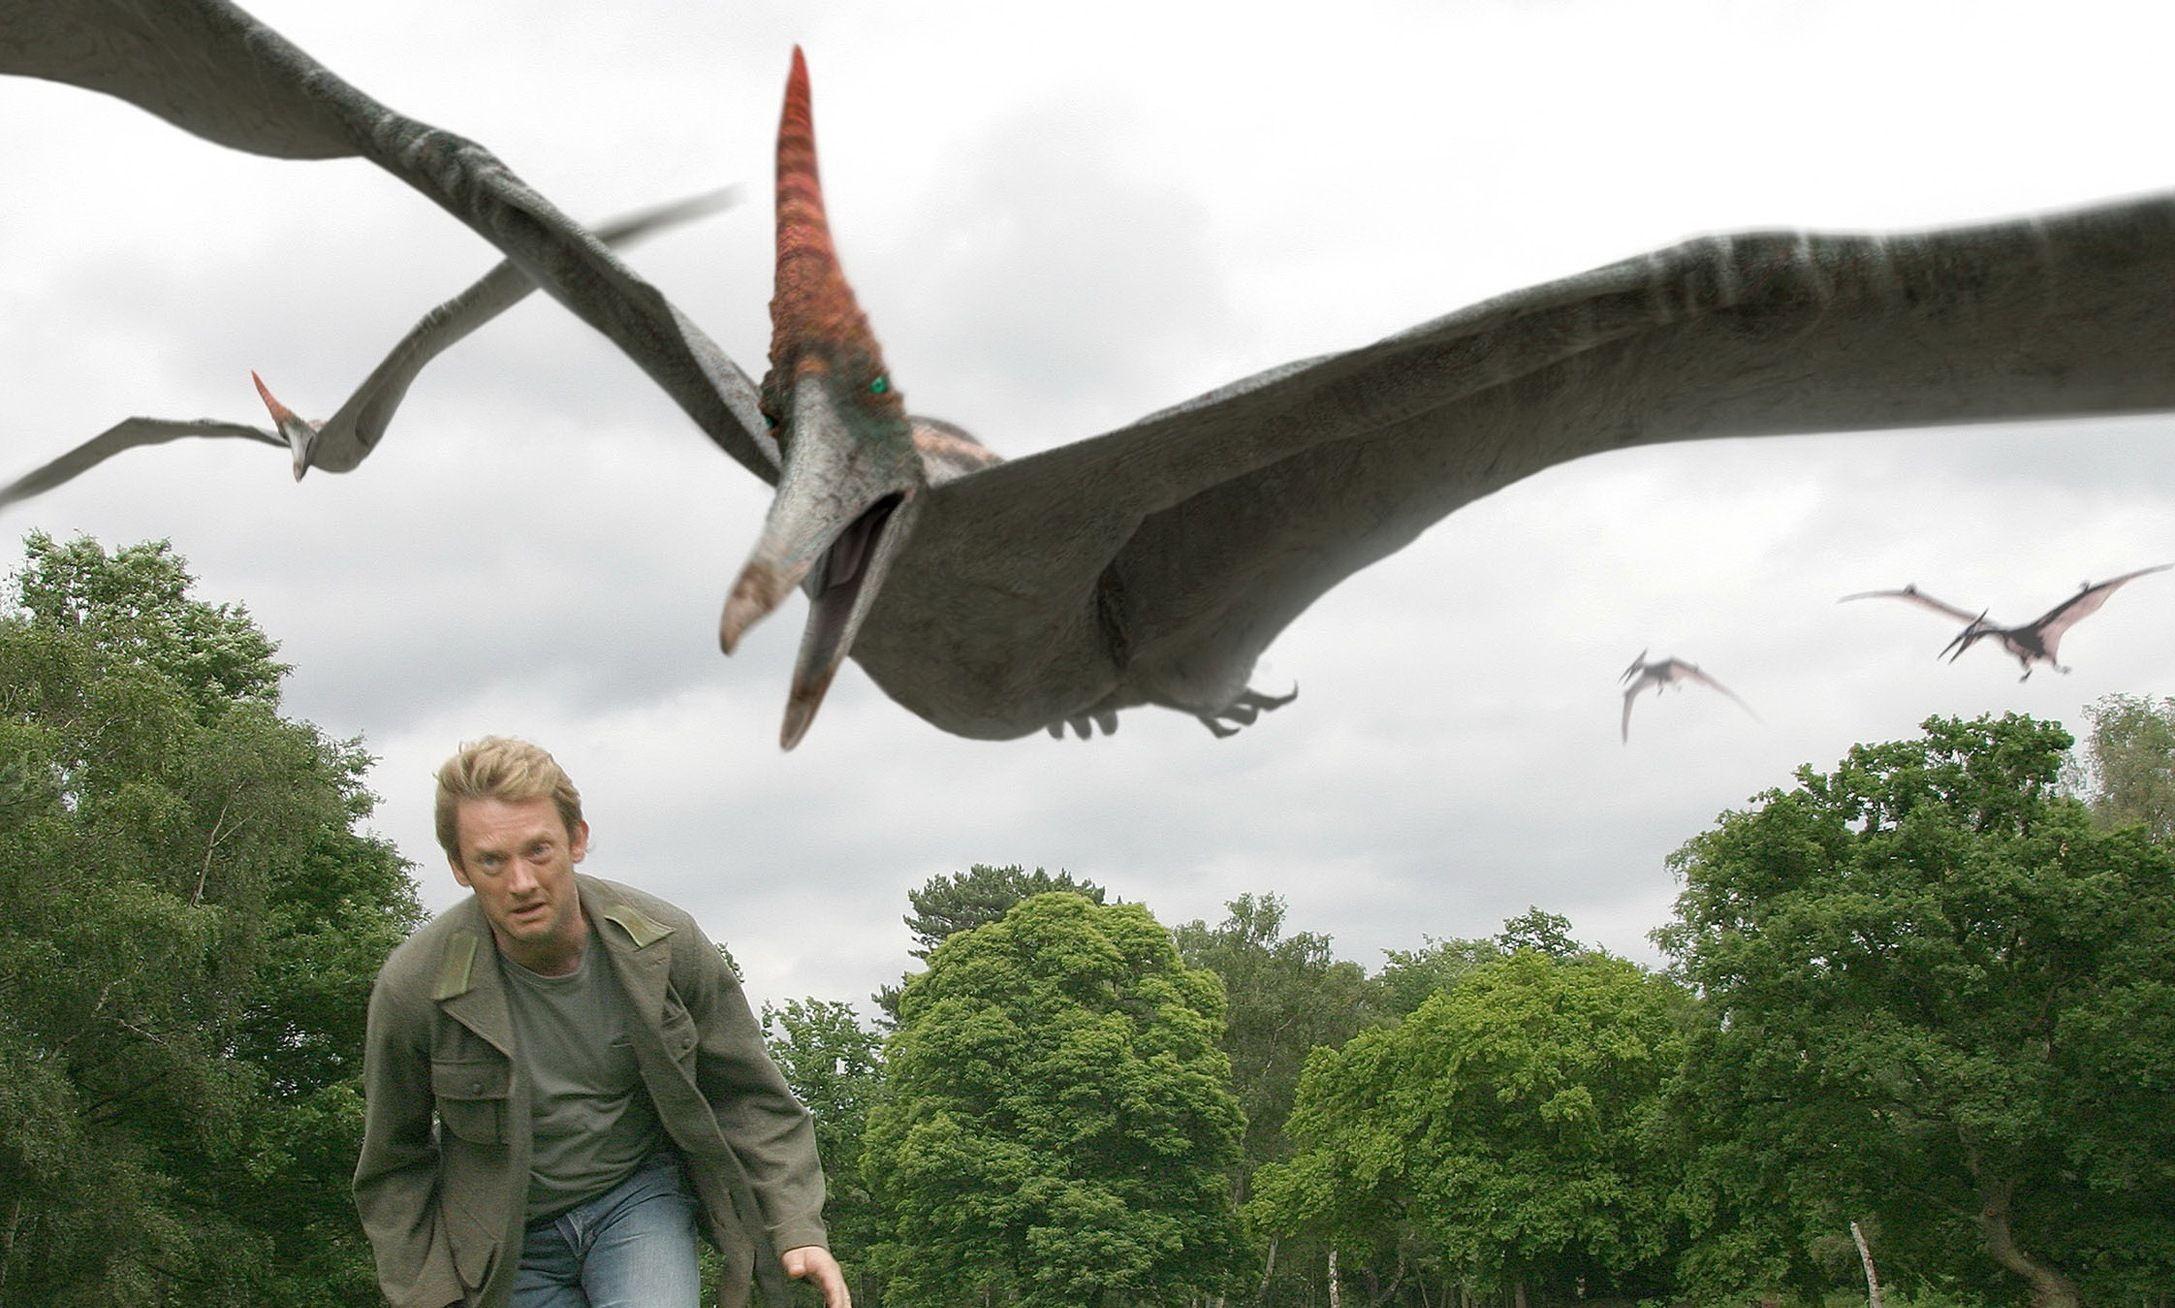 pteranodon jurassic park - Google Search | Primeval new ...